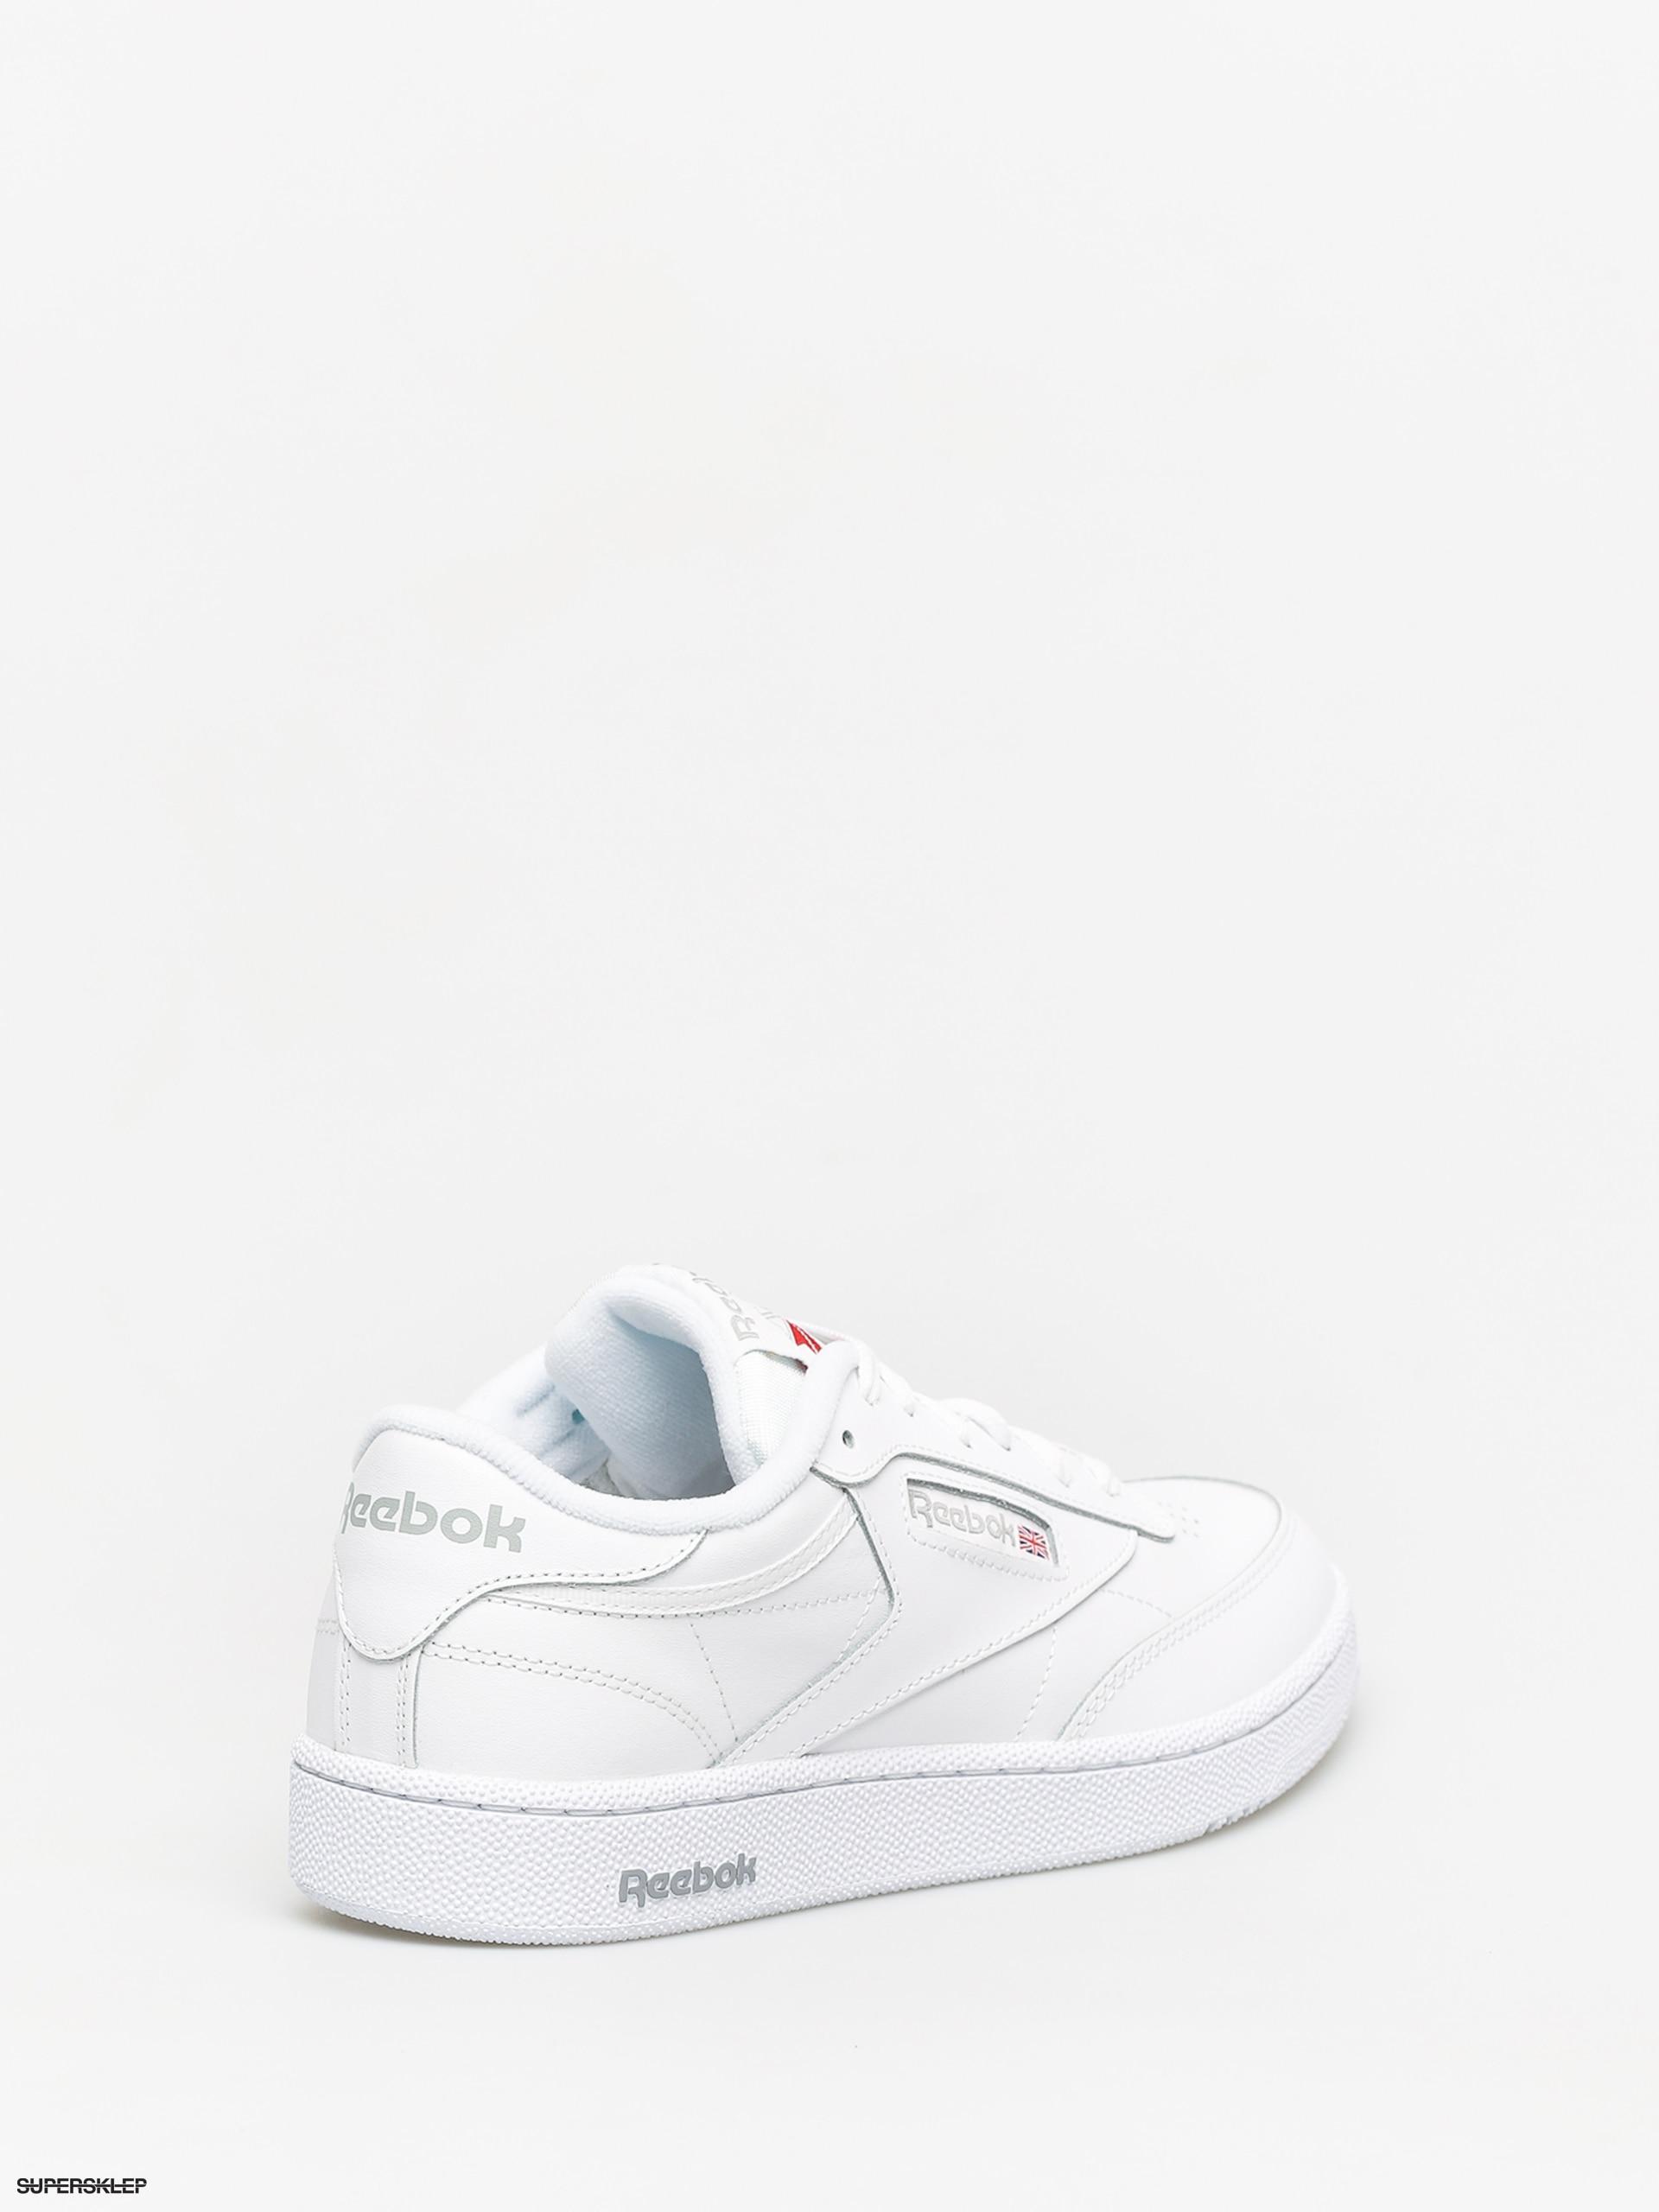 WAS $70 White// Sheer Grey Reebok Club C 85 AR0455 Tennis Sneaker